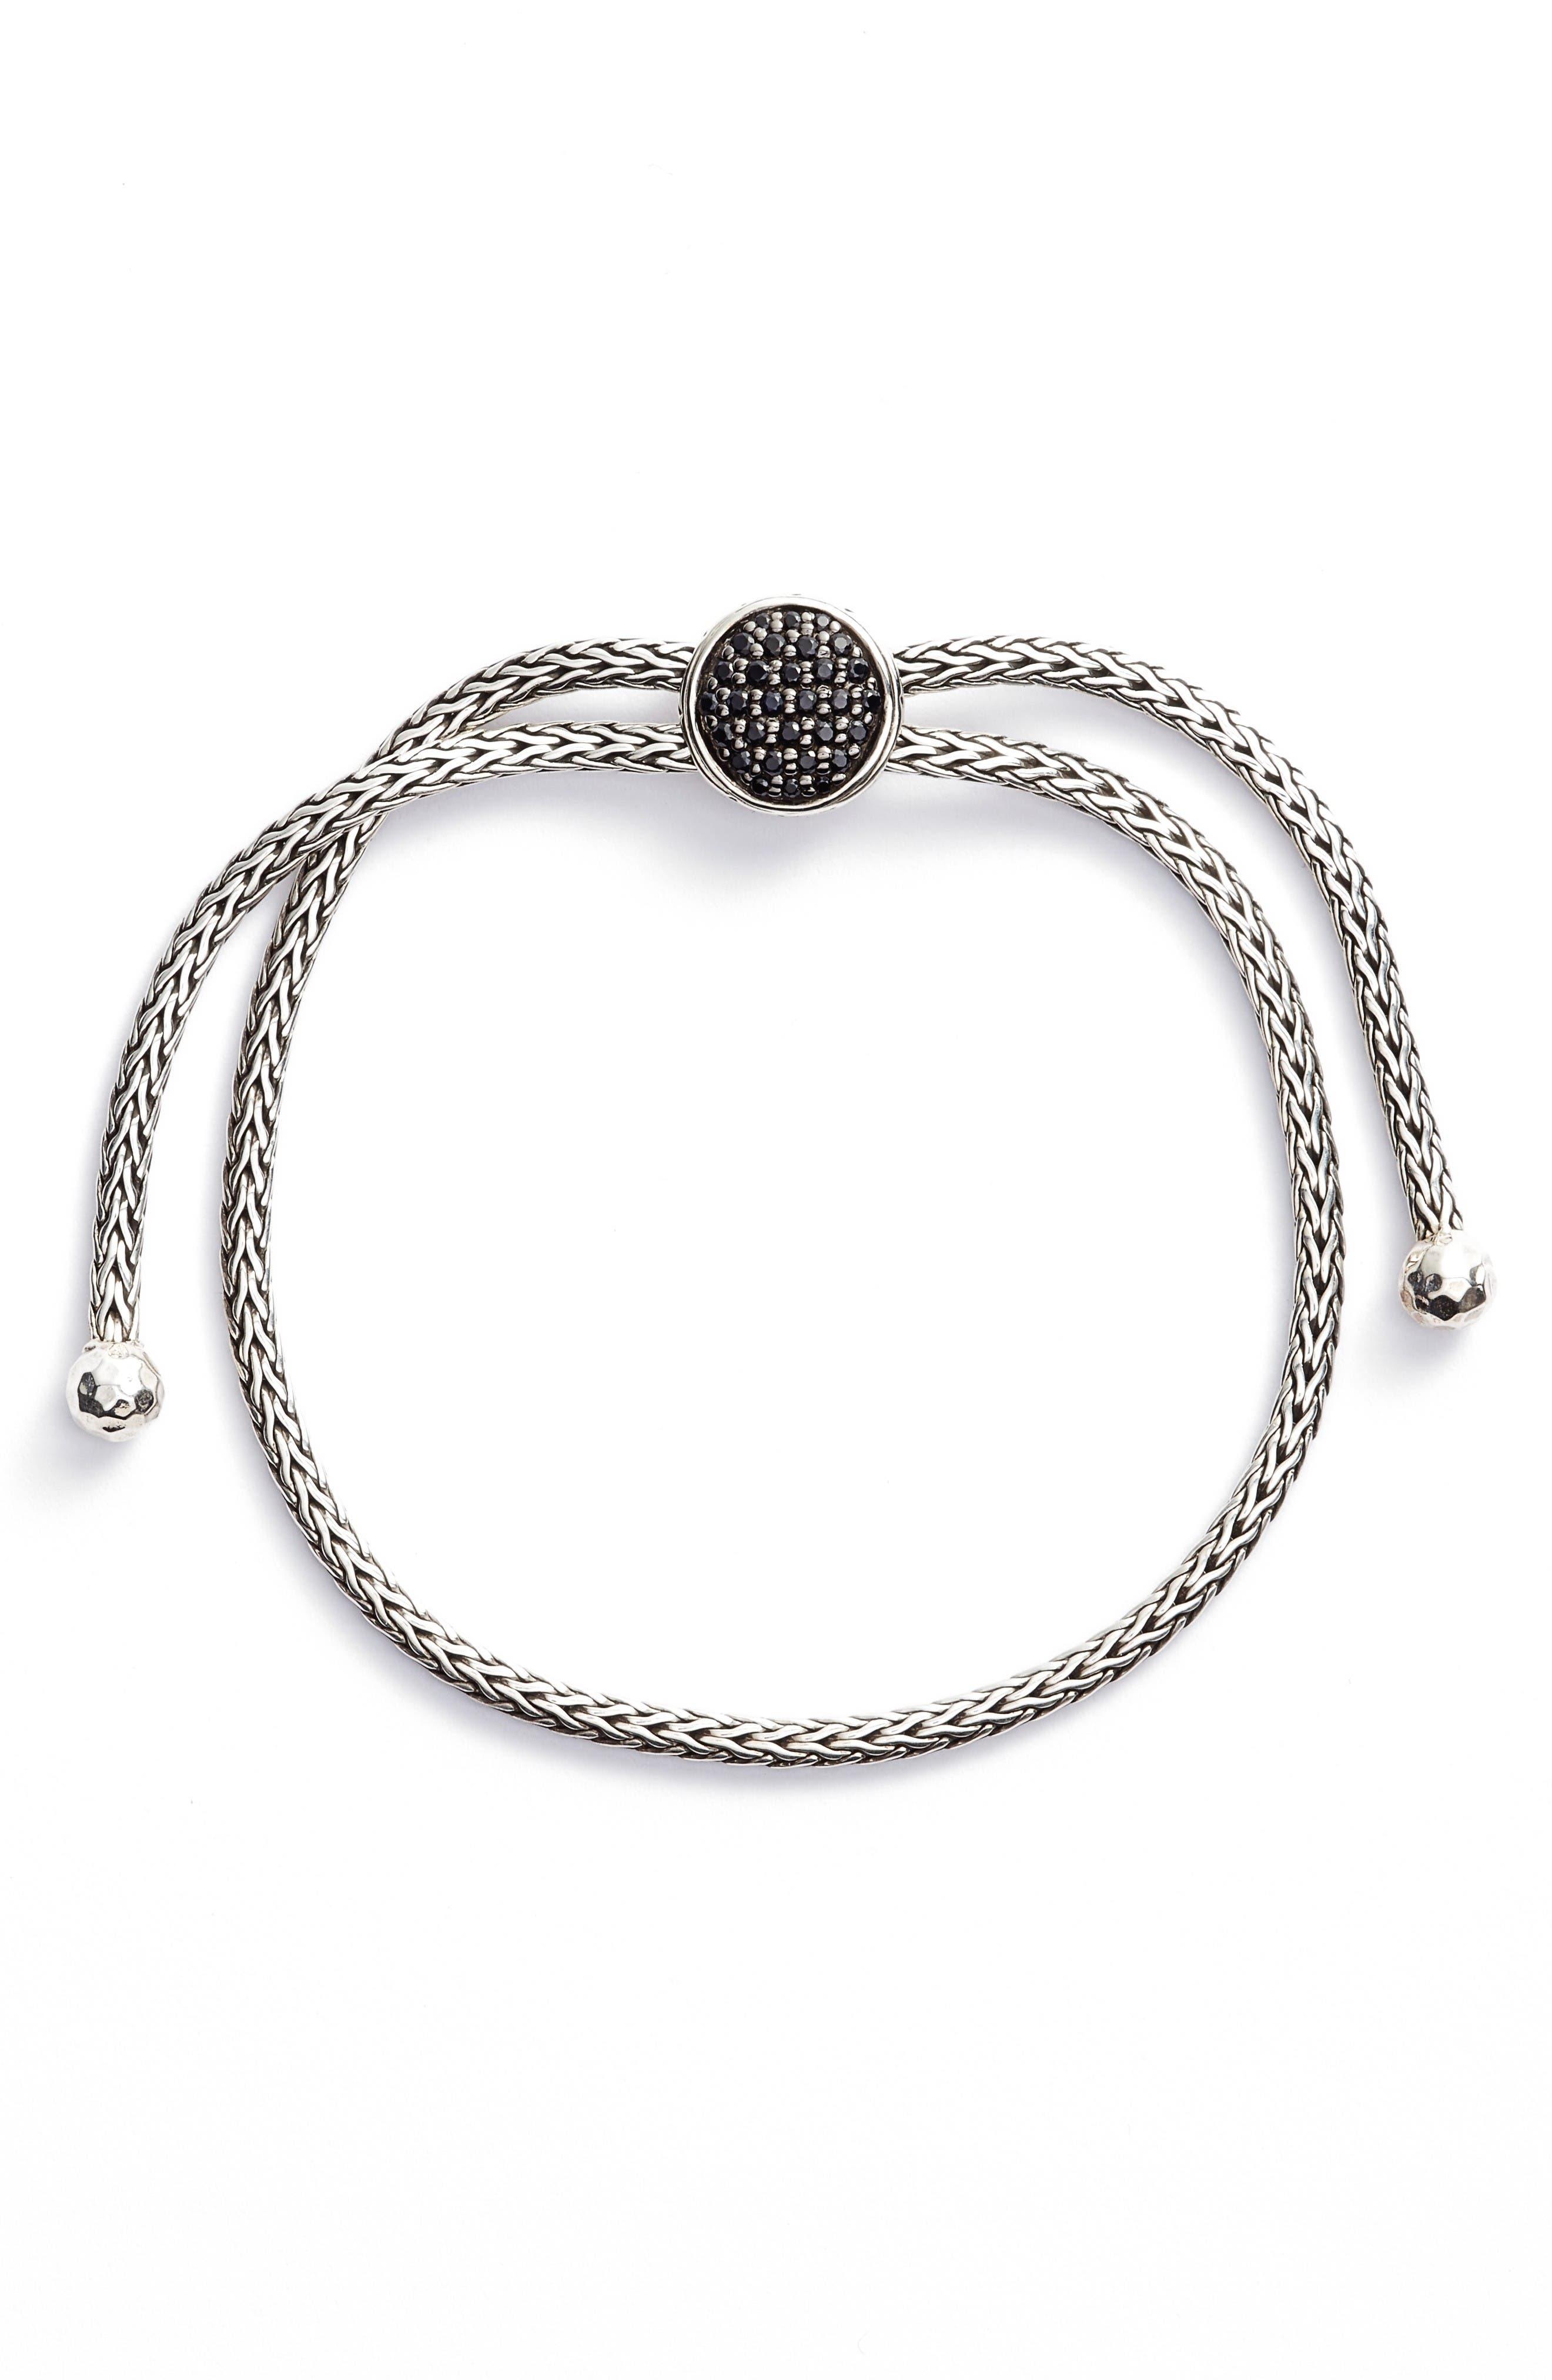 Alternate Image 1 Selected - John Hardy Classic Chain Sapphire Pull Bracelet